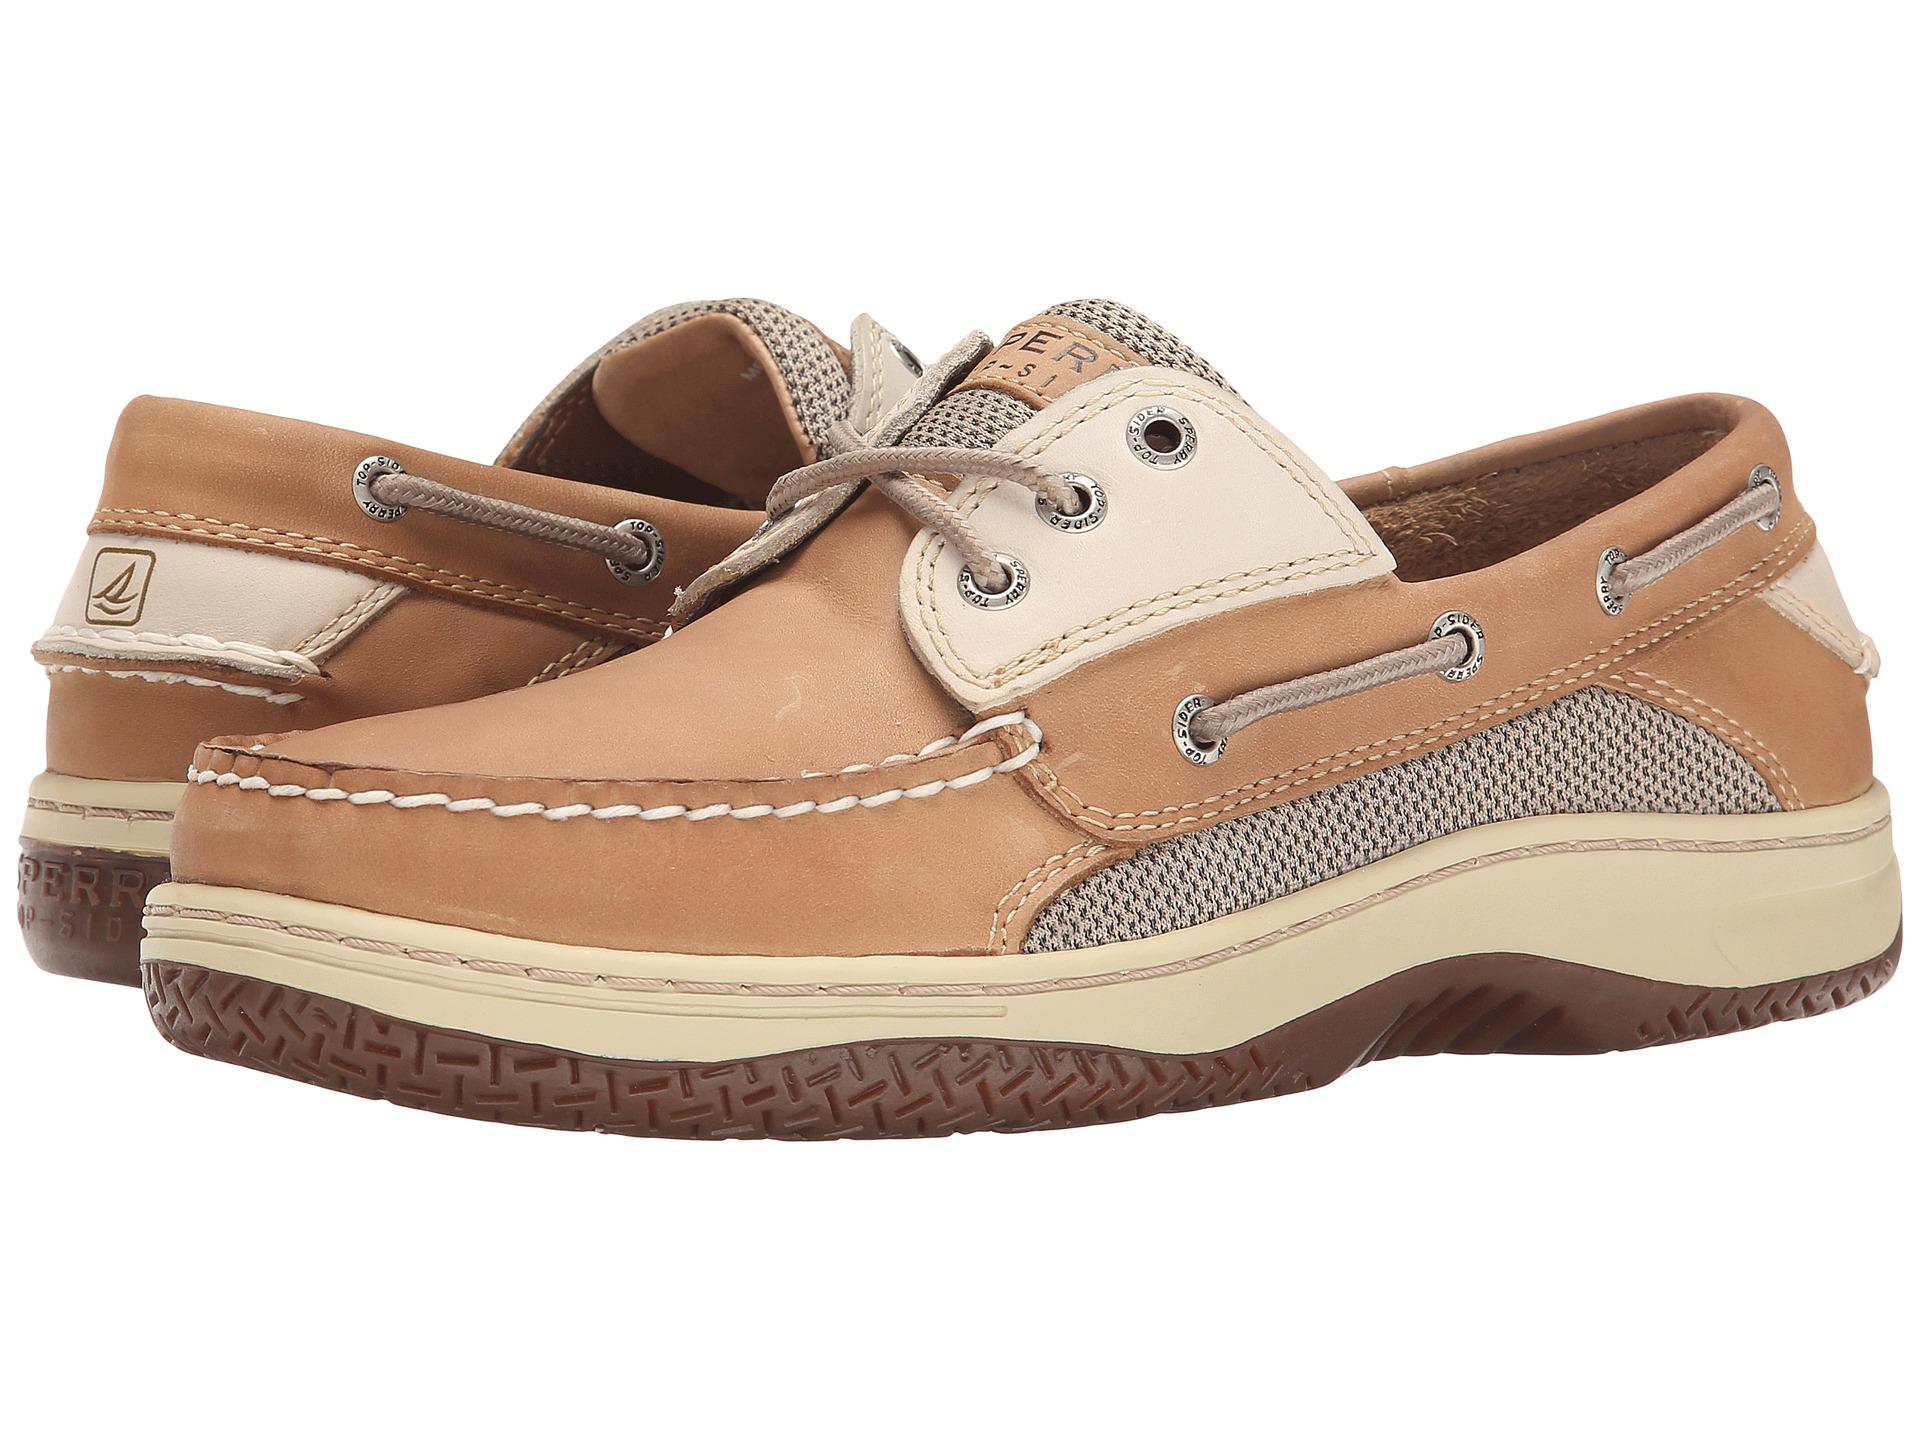 Sperry Top-Sider Billfish 3-Eye Boat Shoe - Zappos.com ...